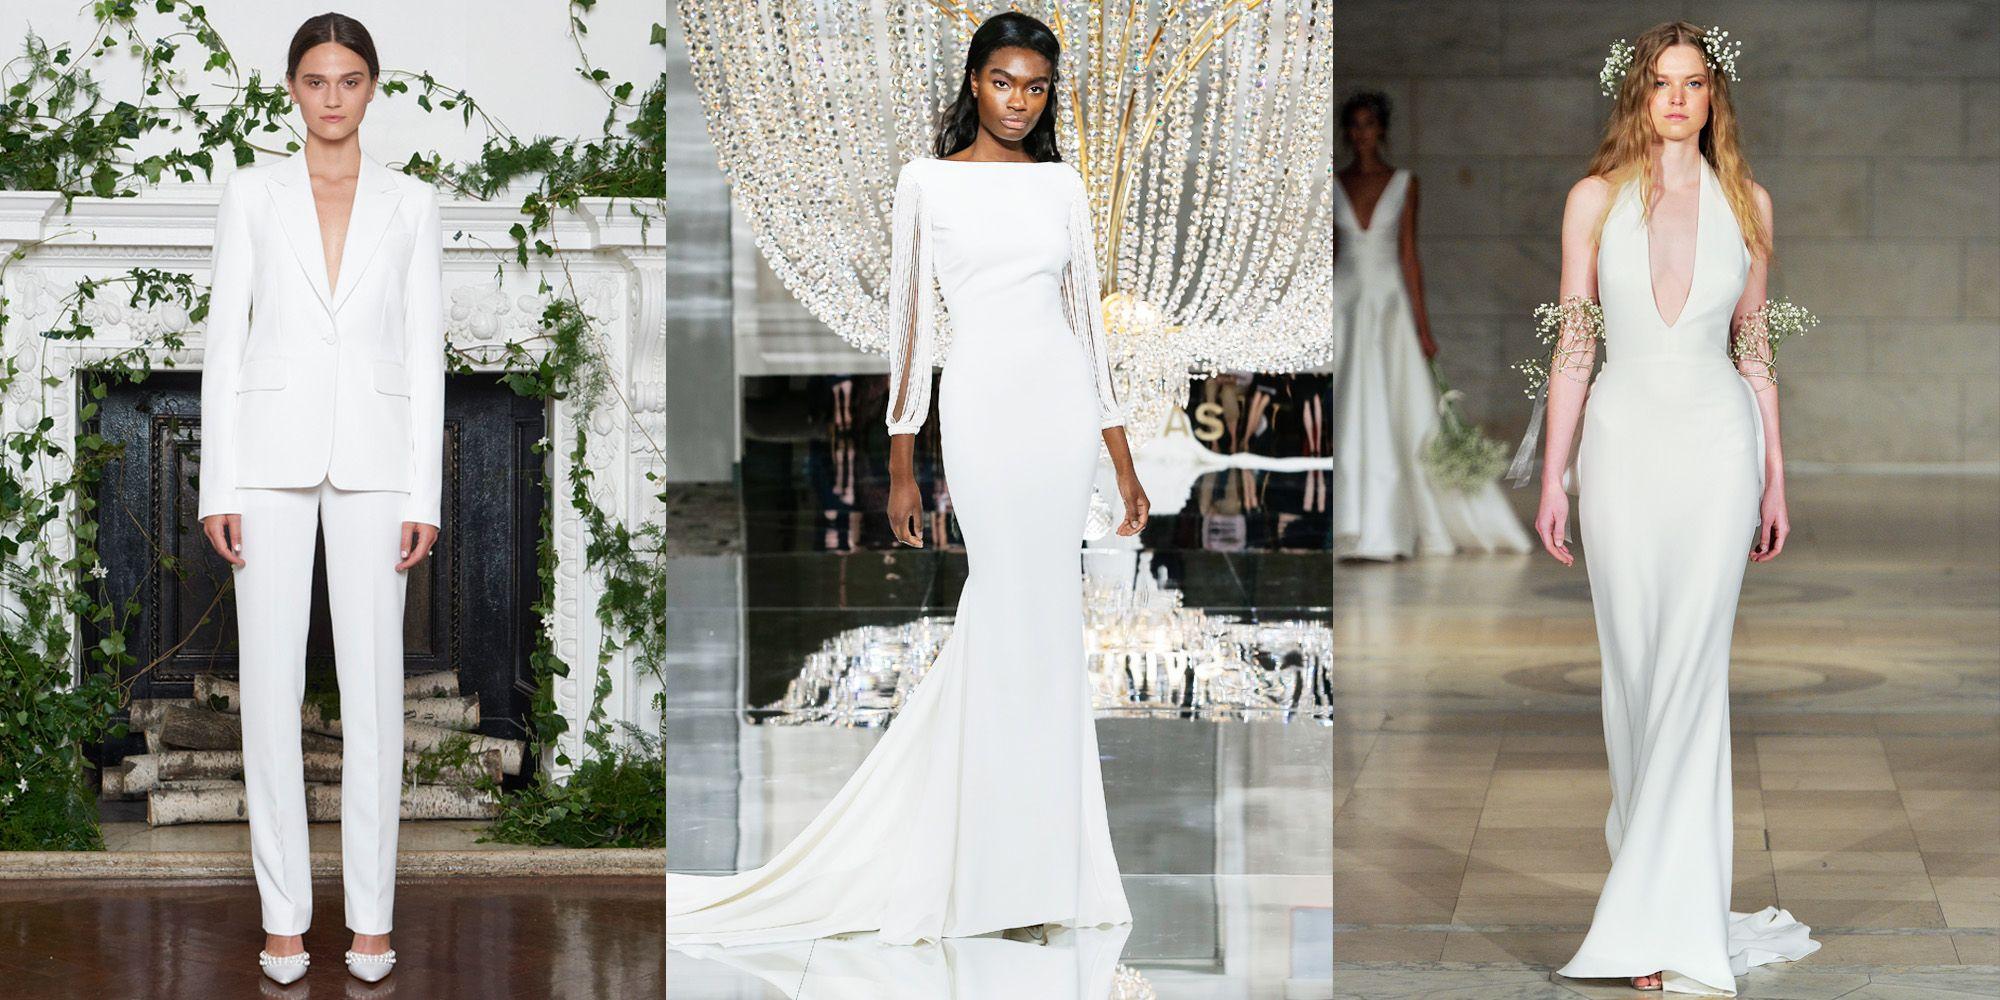 Dress style fall 2018 wedding